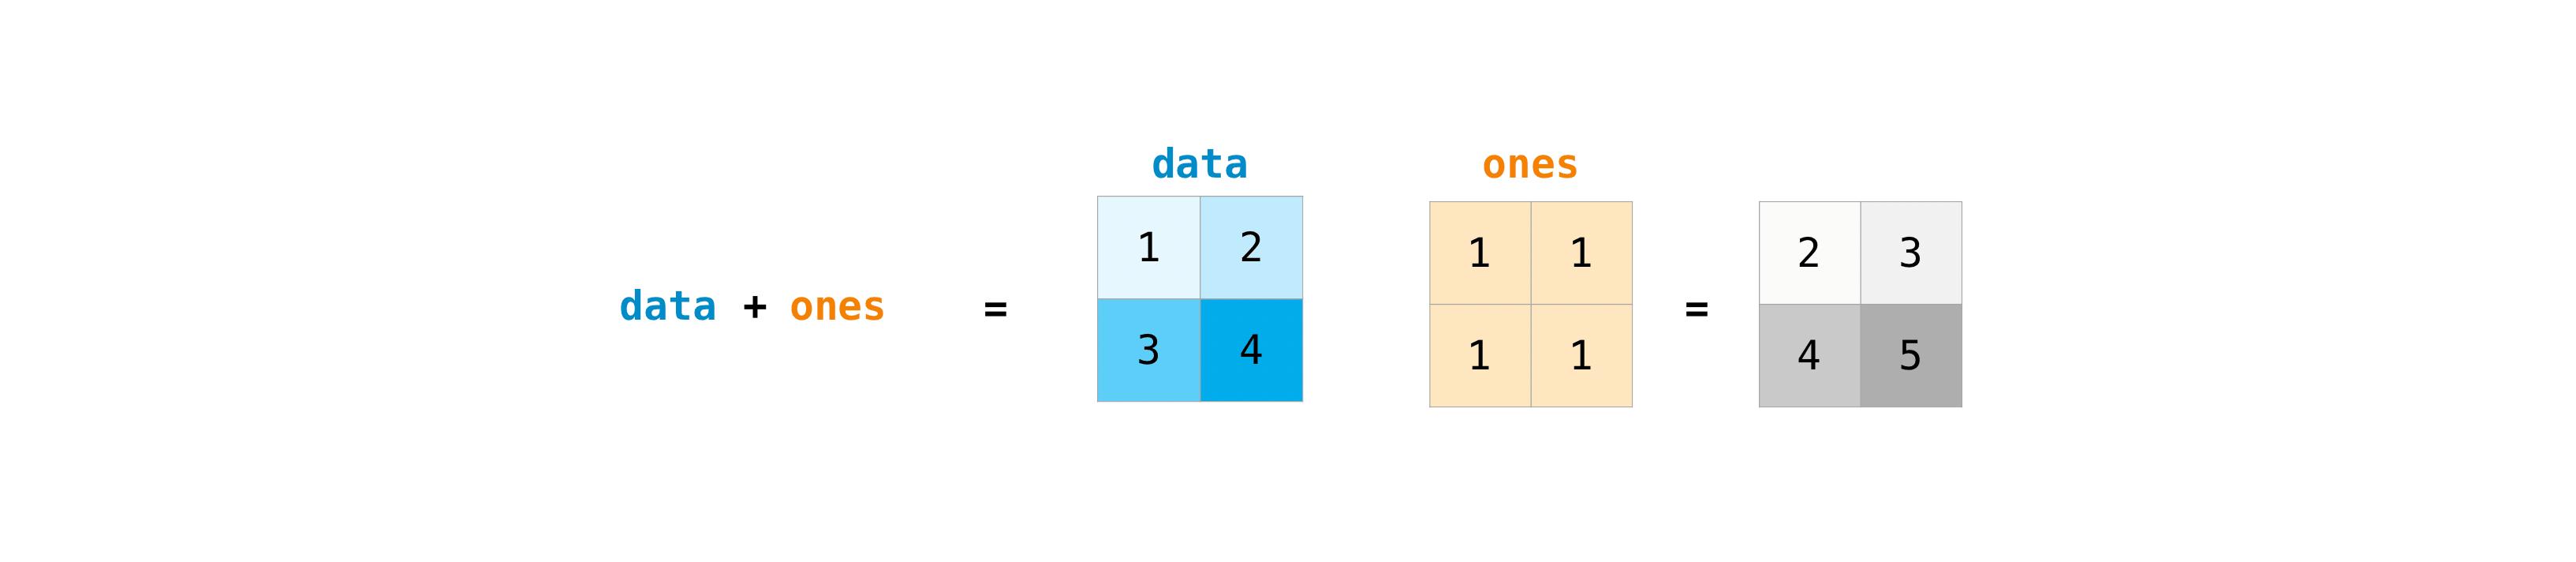 ../_images/np_matrix_arithmetic.png